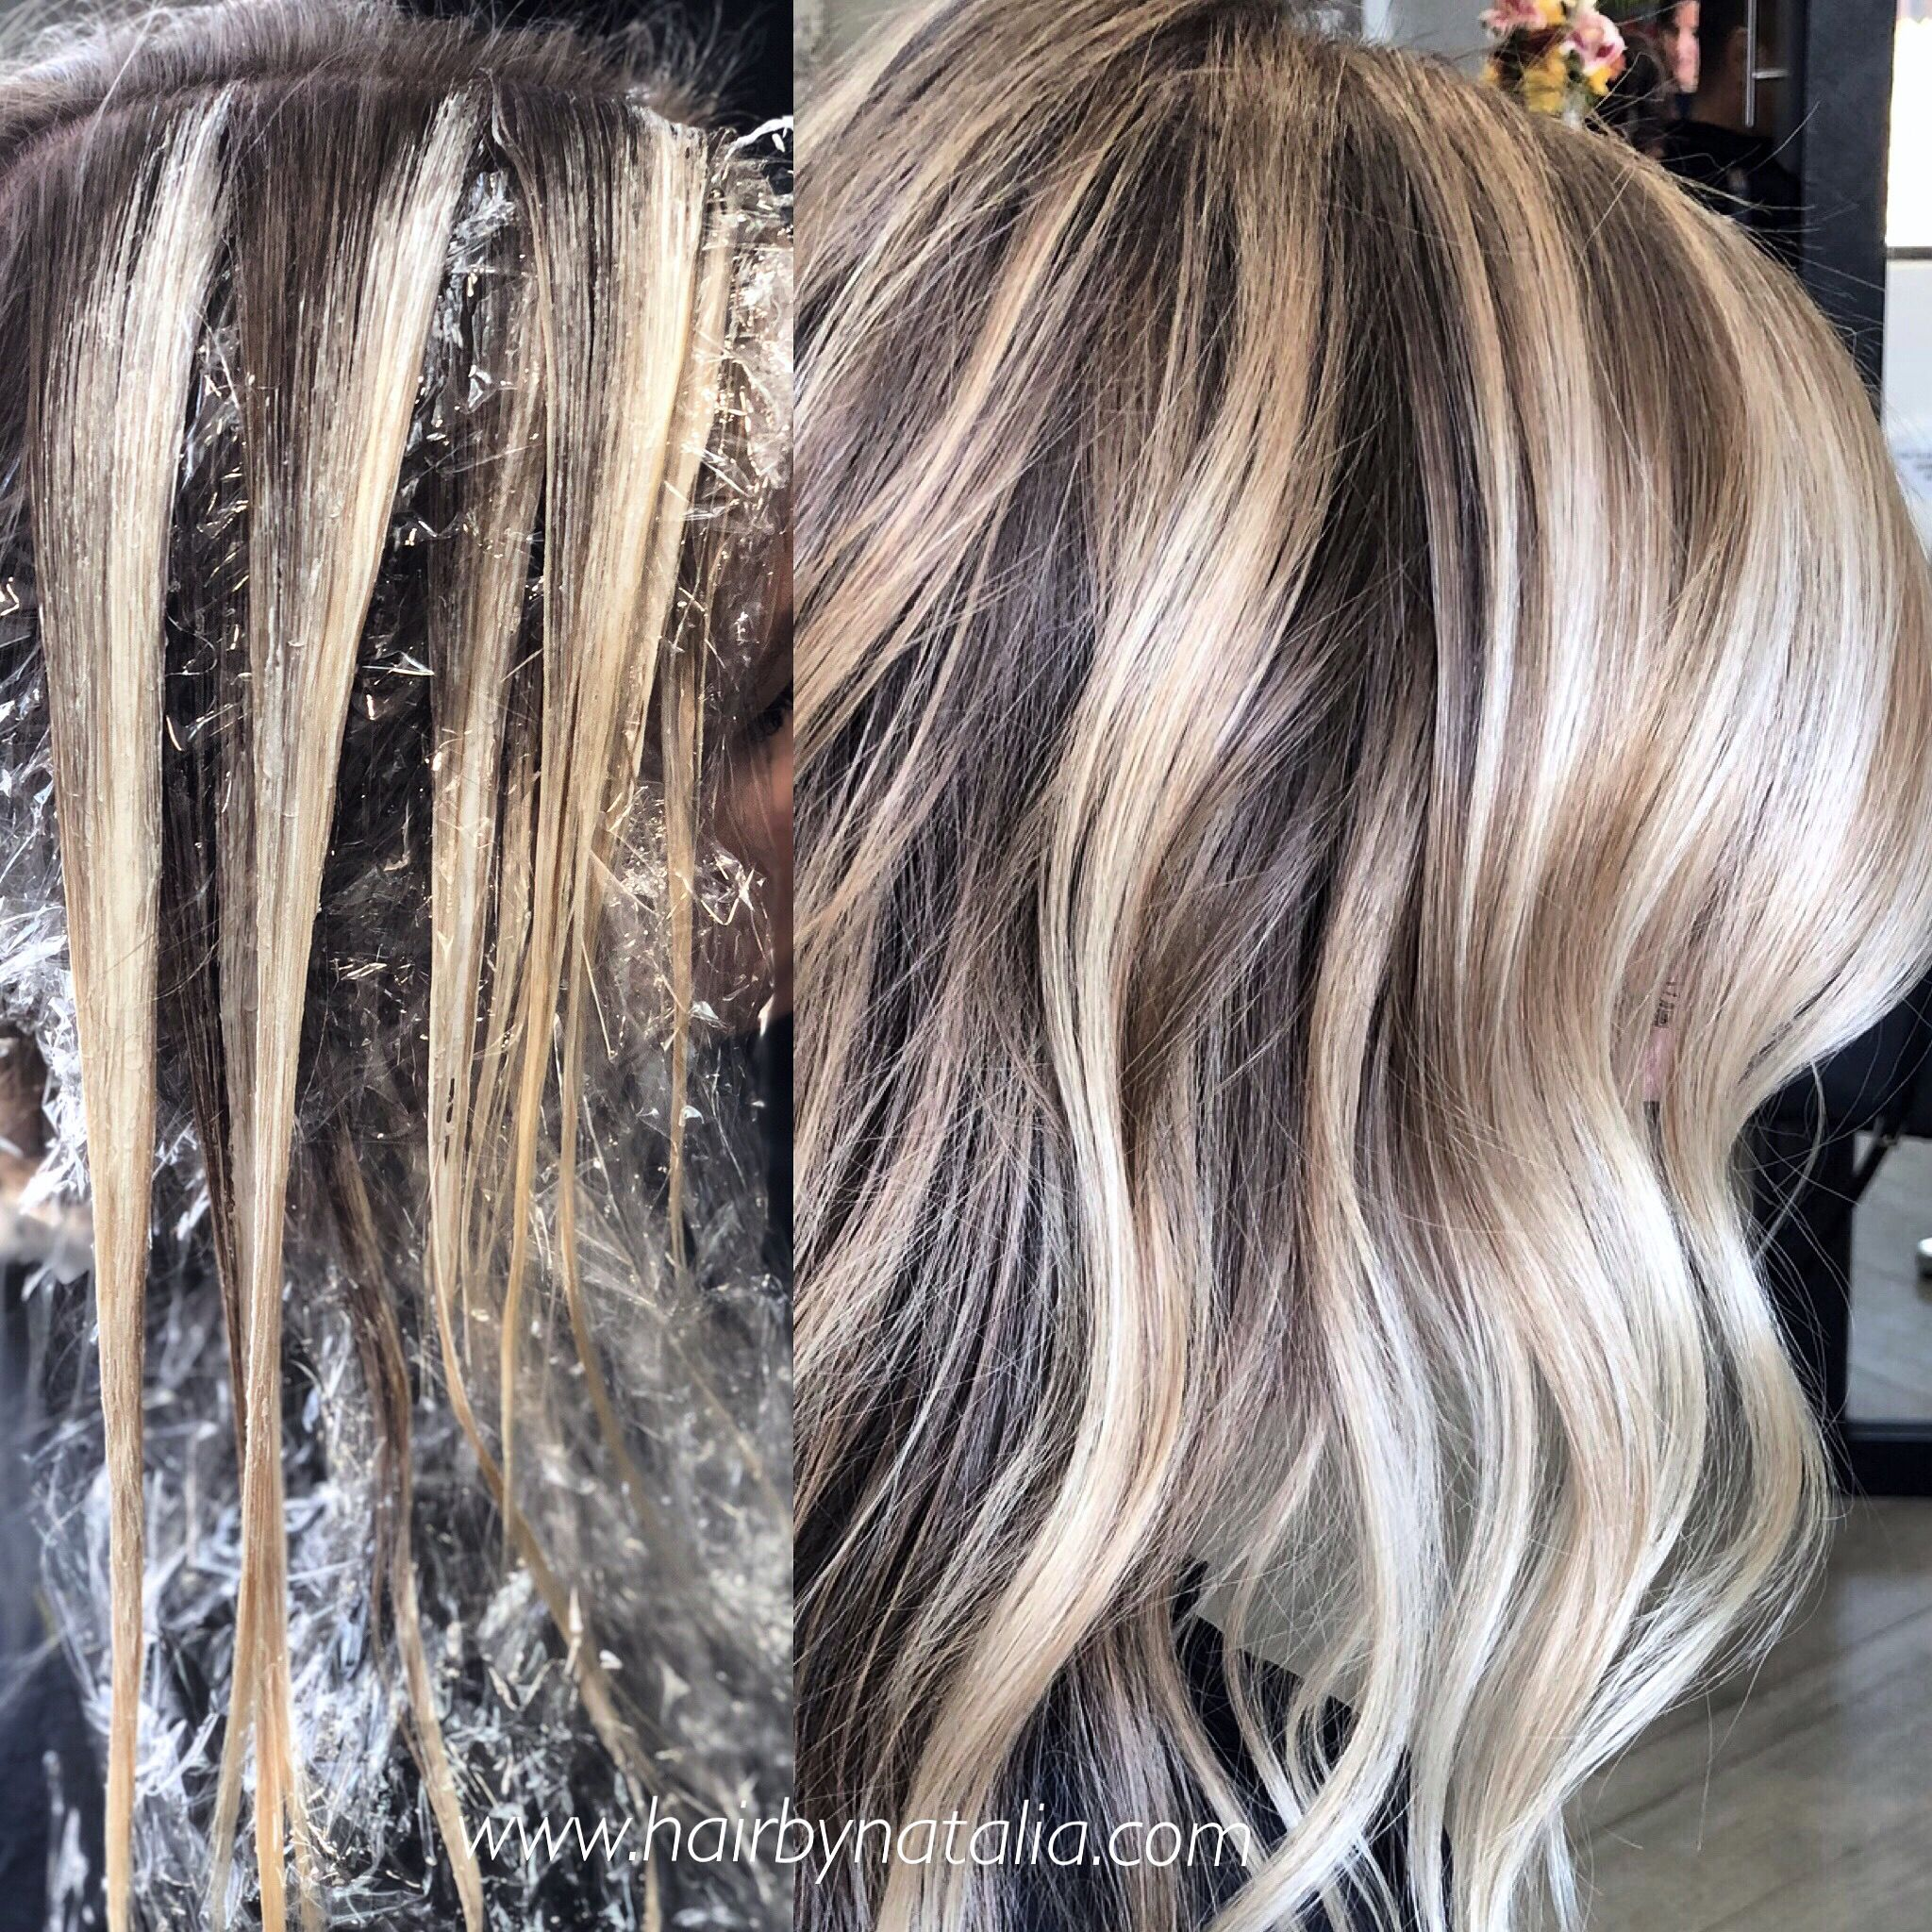 Balayage Hair Painting Technique Balayage Hair Short Hair